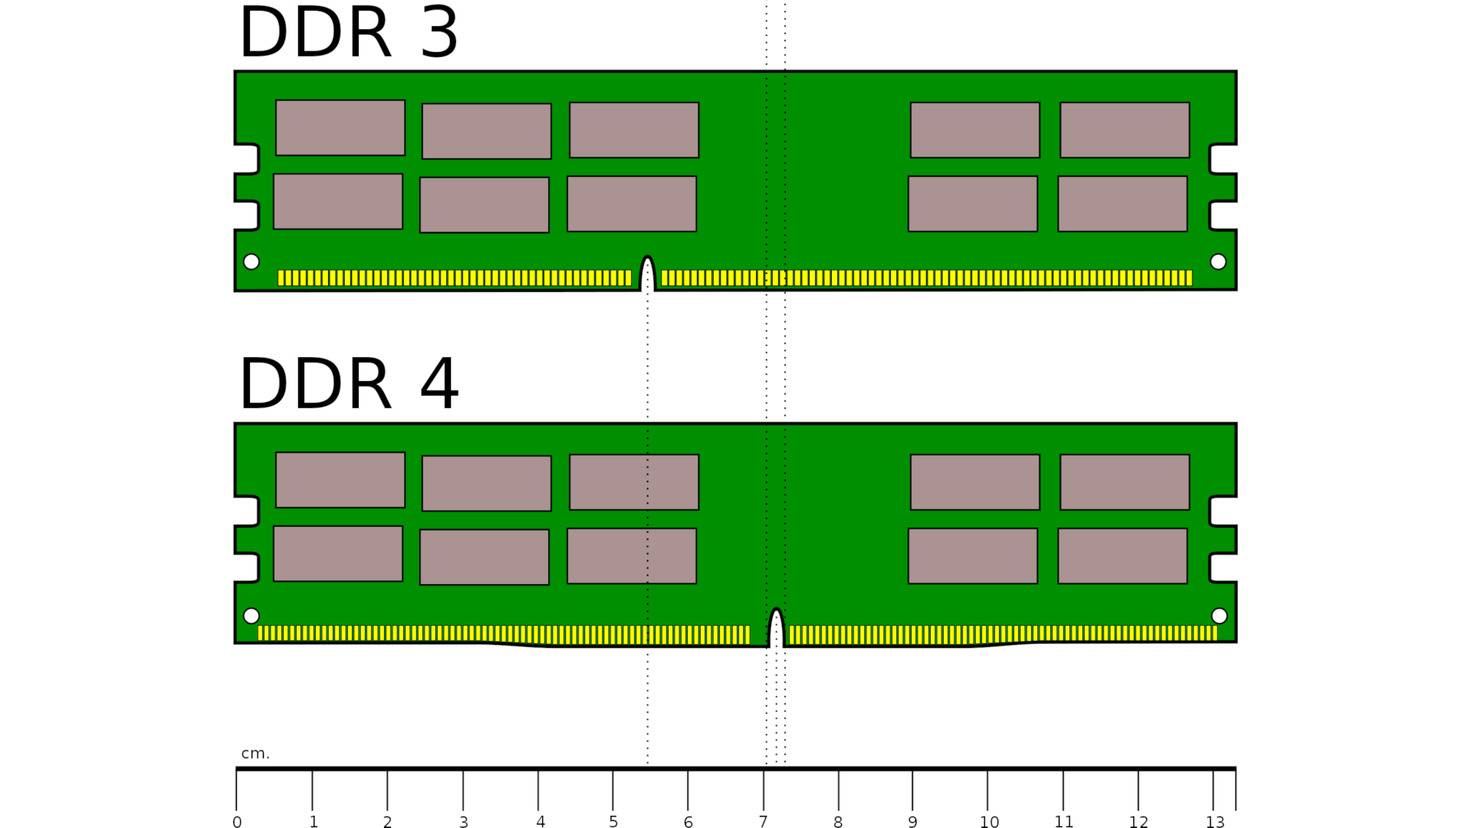 DDR3-DDR4-RAM-Unterschied-Kerbe